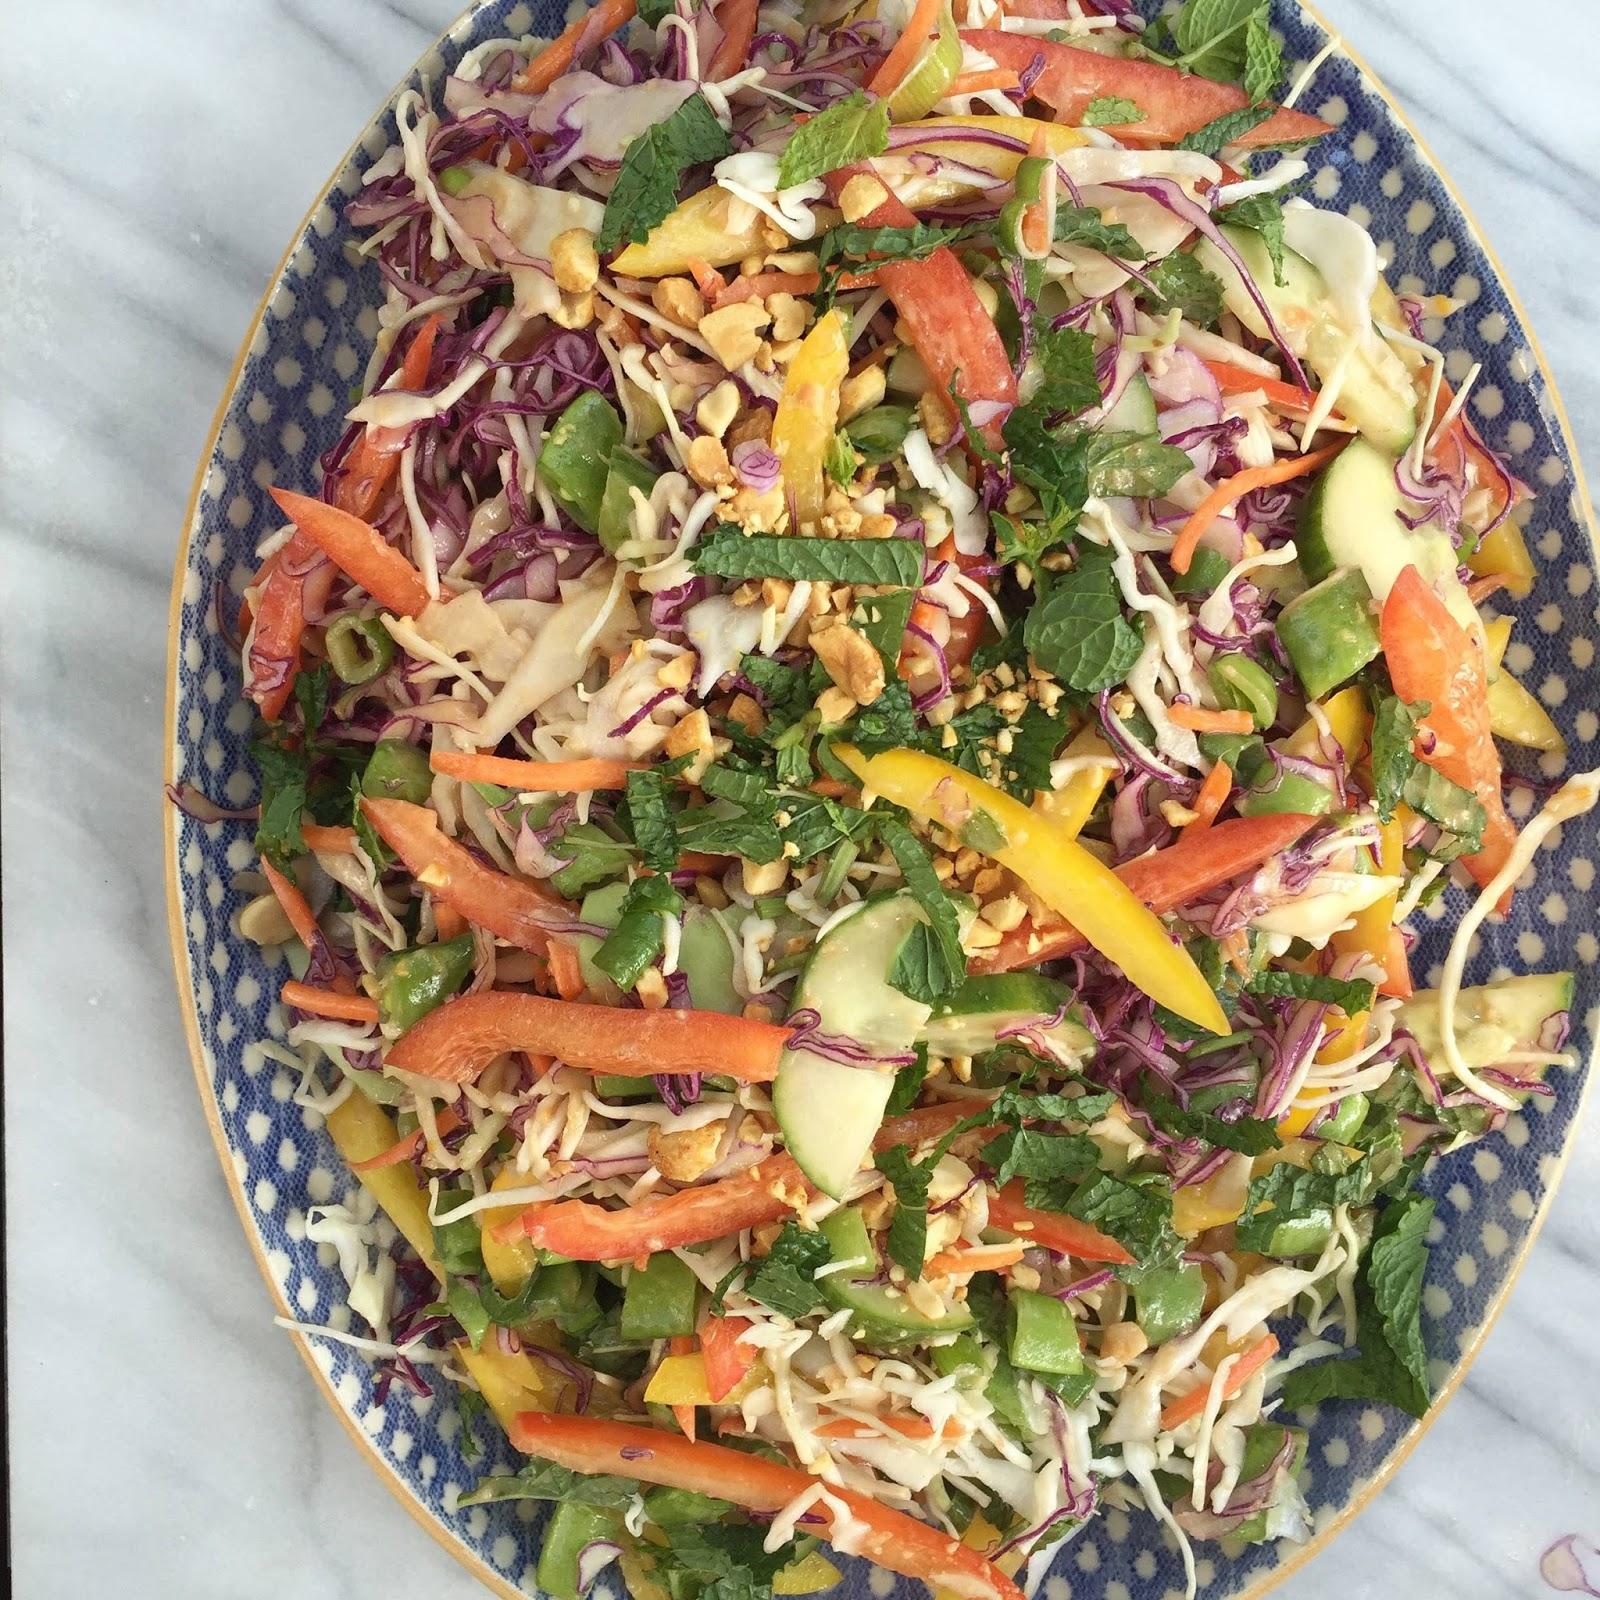 ... Crunchy Thai Salad + Spicy Peanut Dressing | Nordstrom Clearance Sale